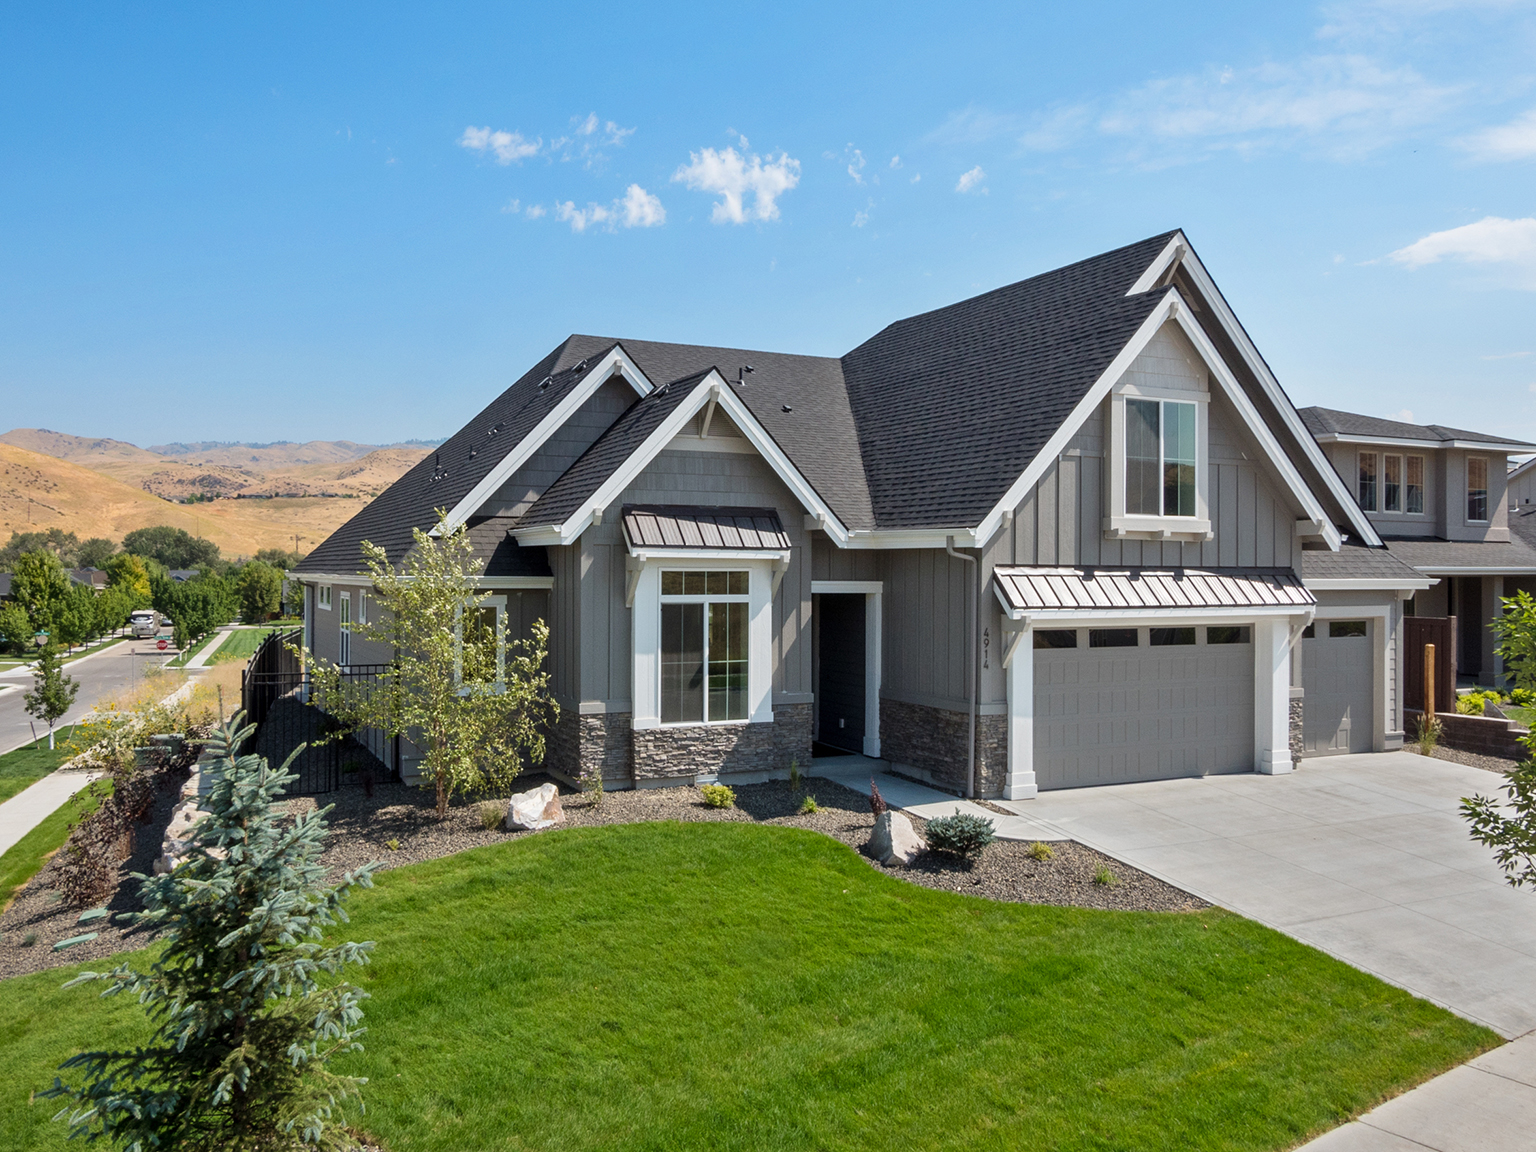 Homes in Boise ID